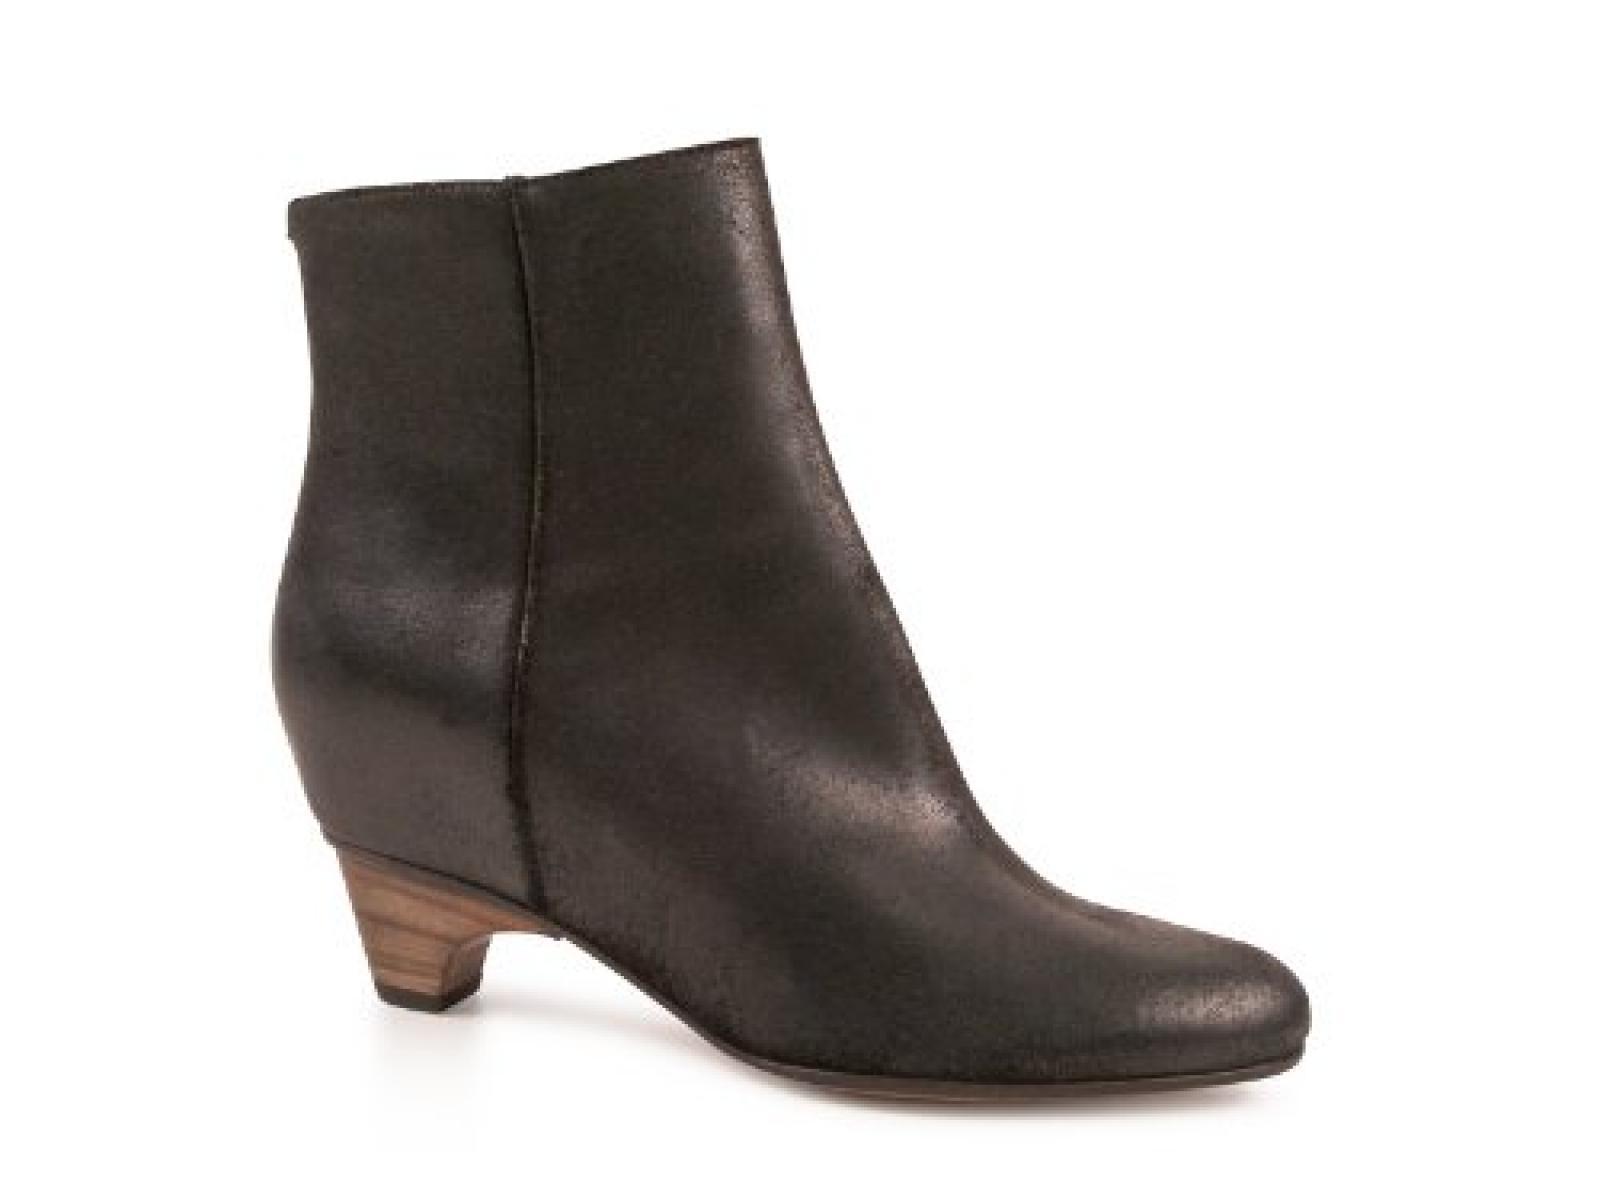 Maison Martin Margiela Frauen midcalf Booties aus schwarzem Camel Leder - Modellnummer: S38WU0235 SX8181 900